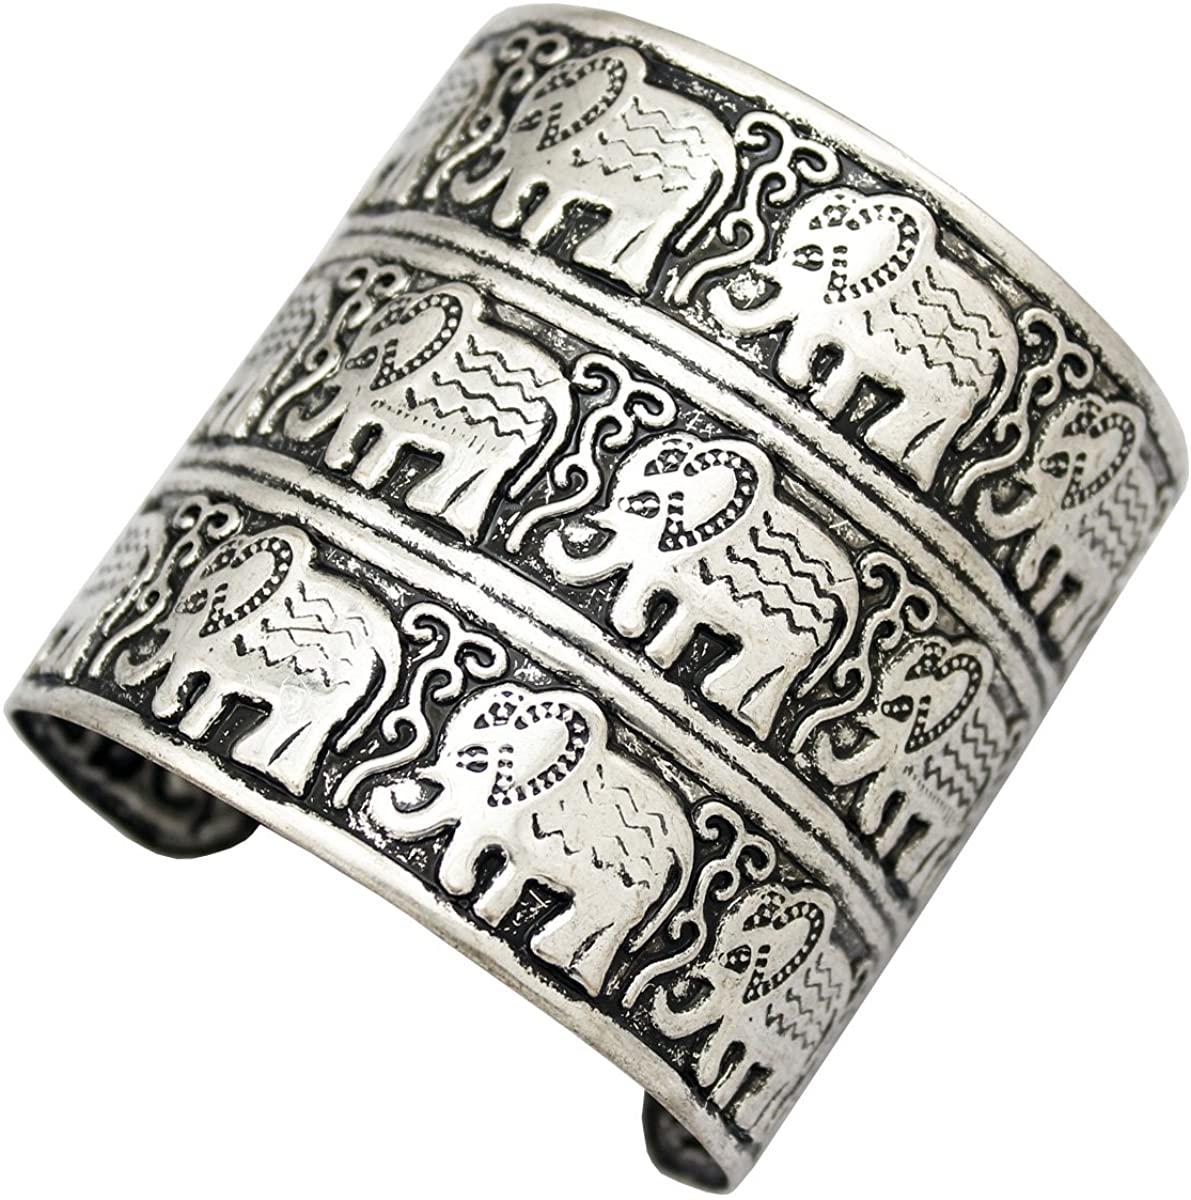 Q&Q Fashion Egypt African Embossed Vintage Elephant OM Hindu Ganesha Bracelet Bangle Cuff